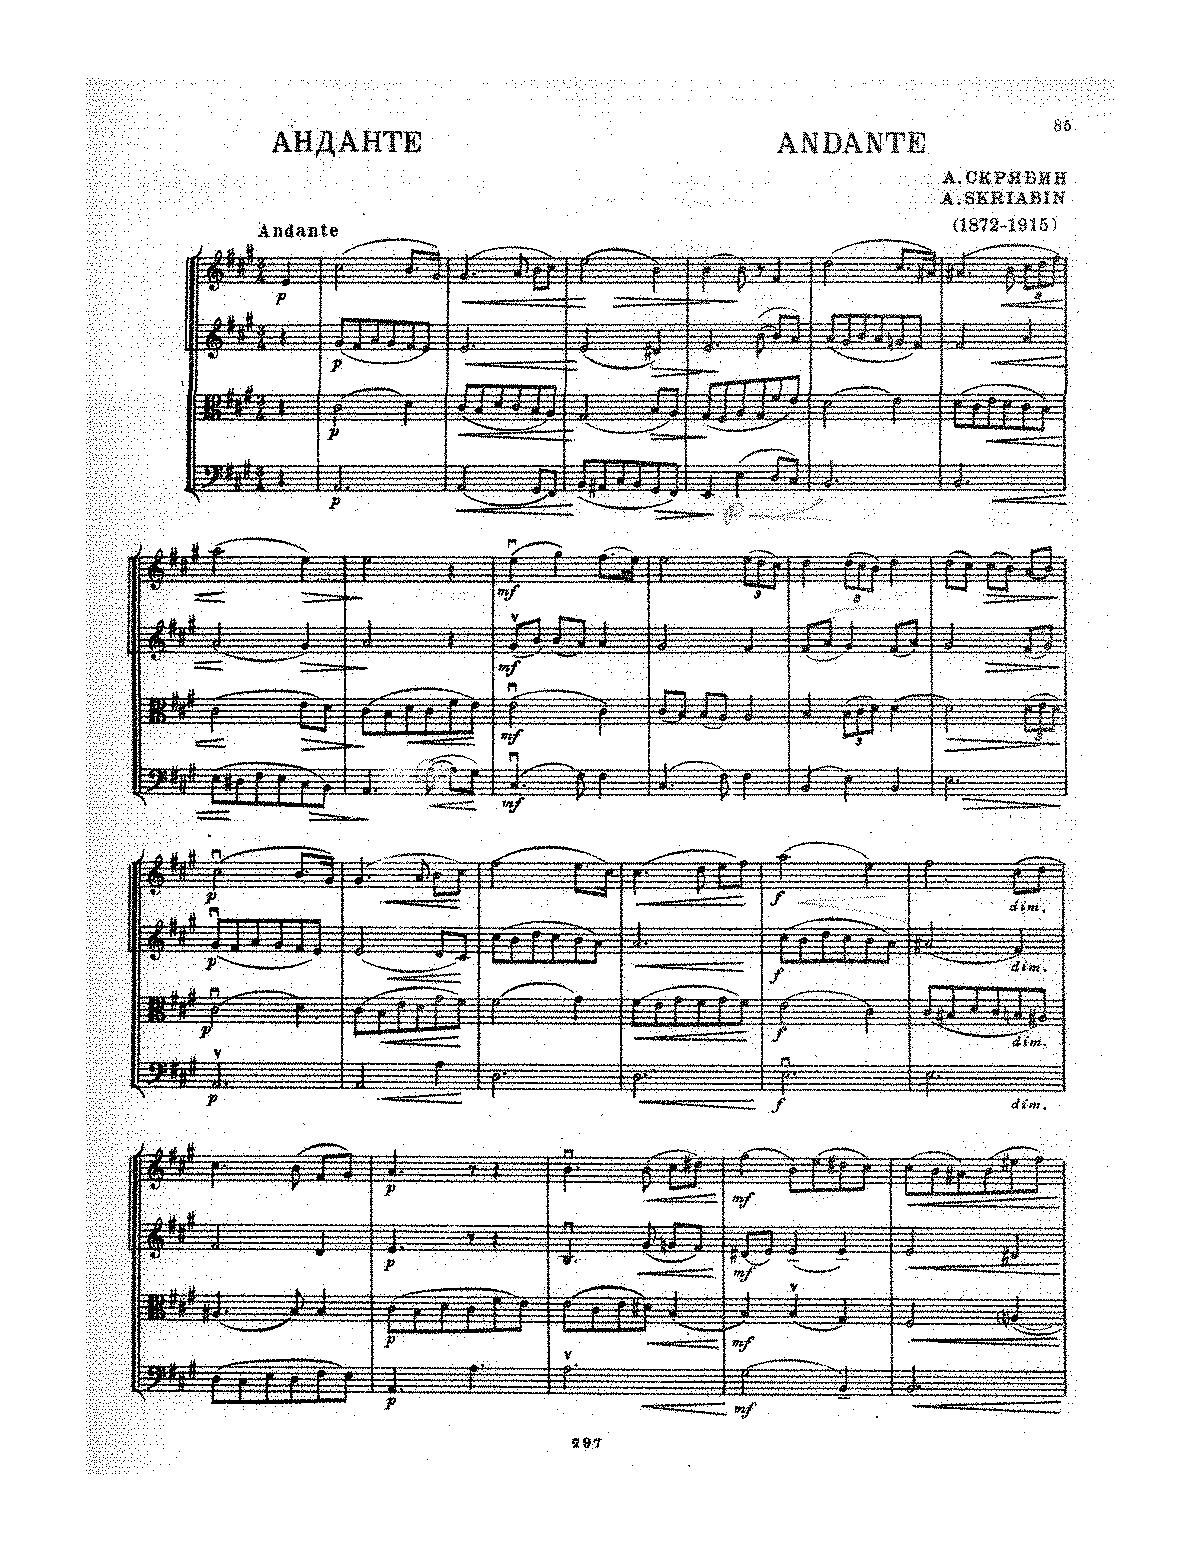 Andante for string orchestra scriabin aleksandr imslp general information hexwebz Images